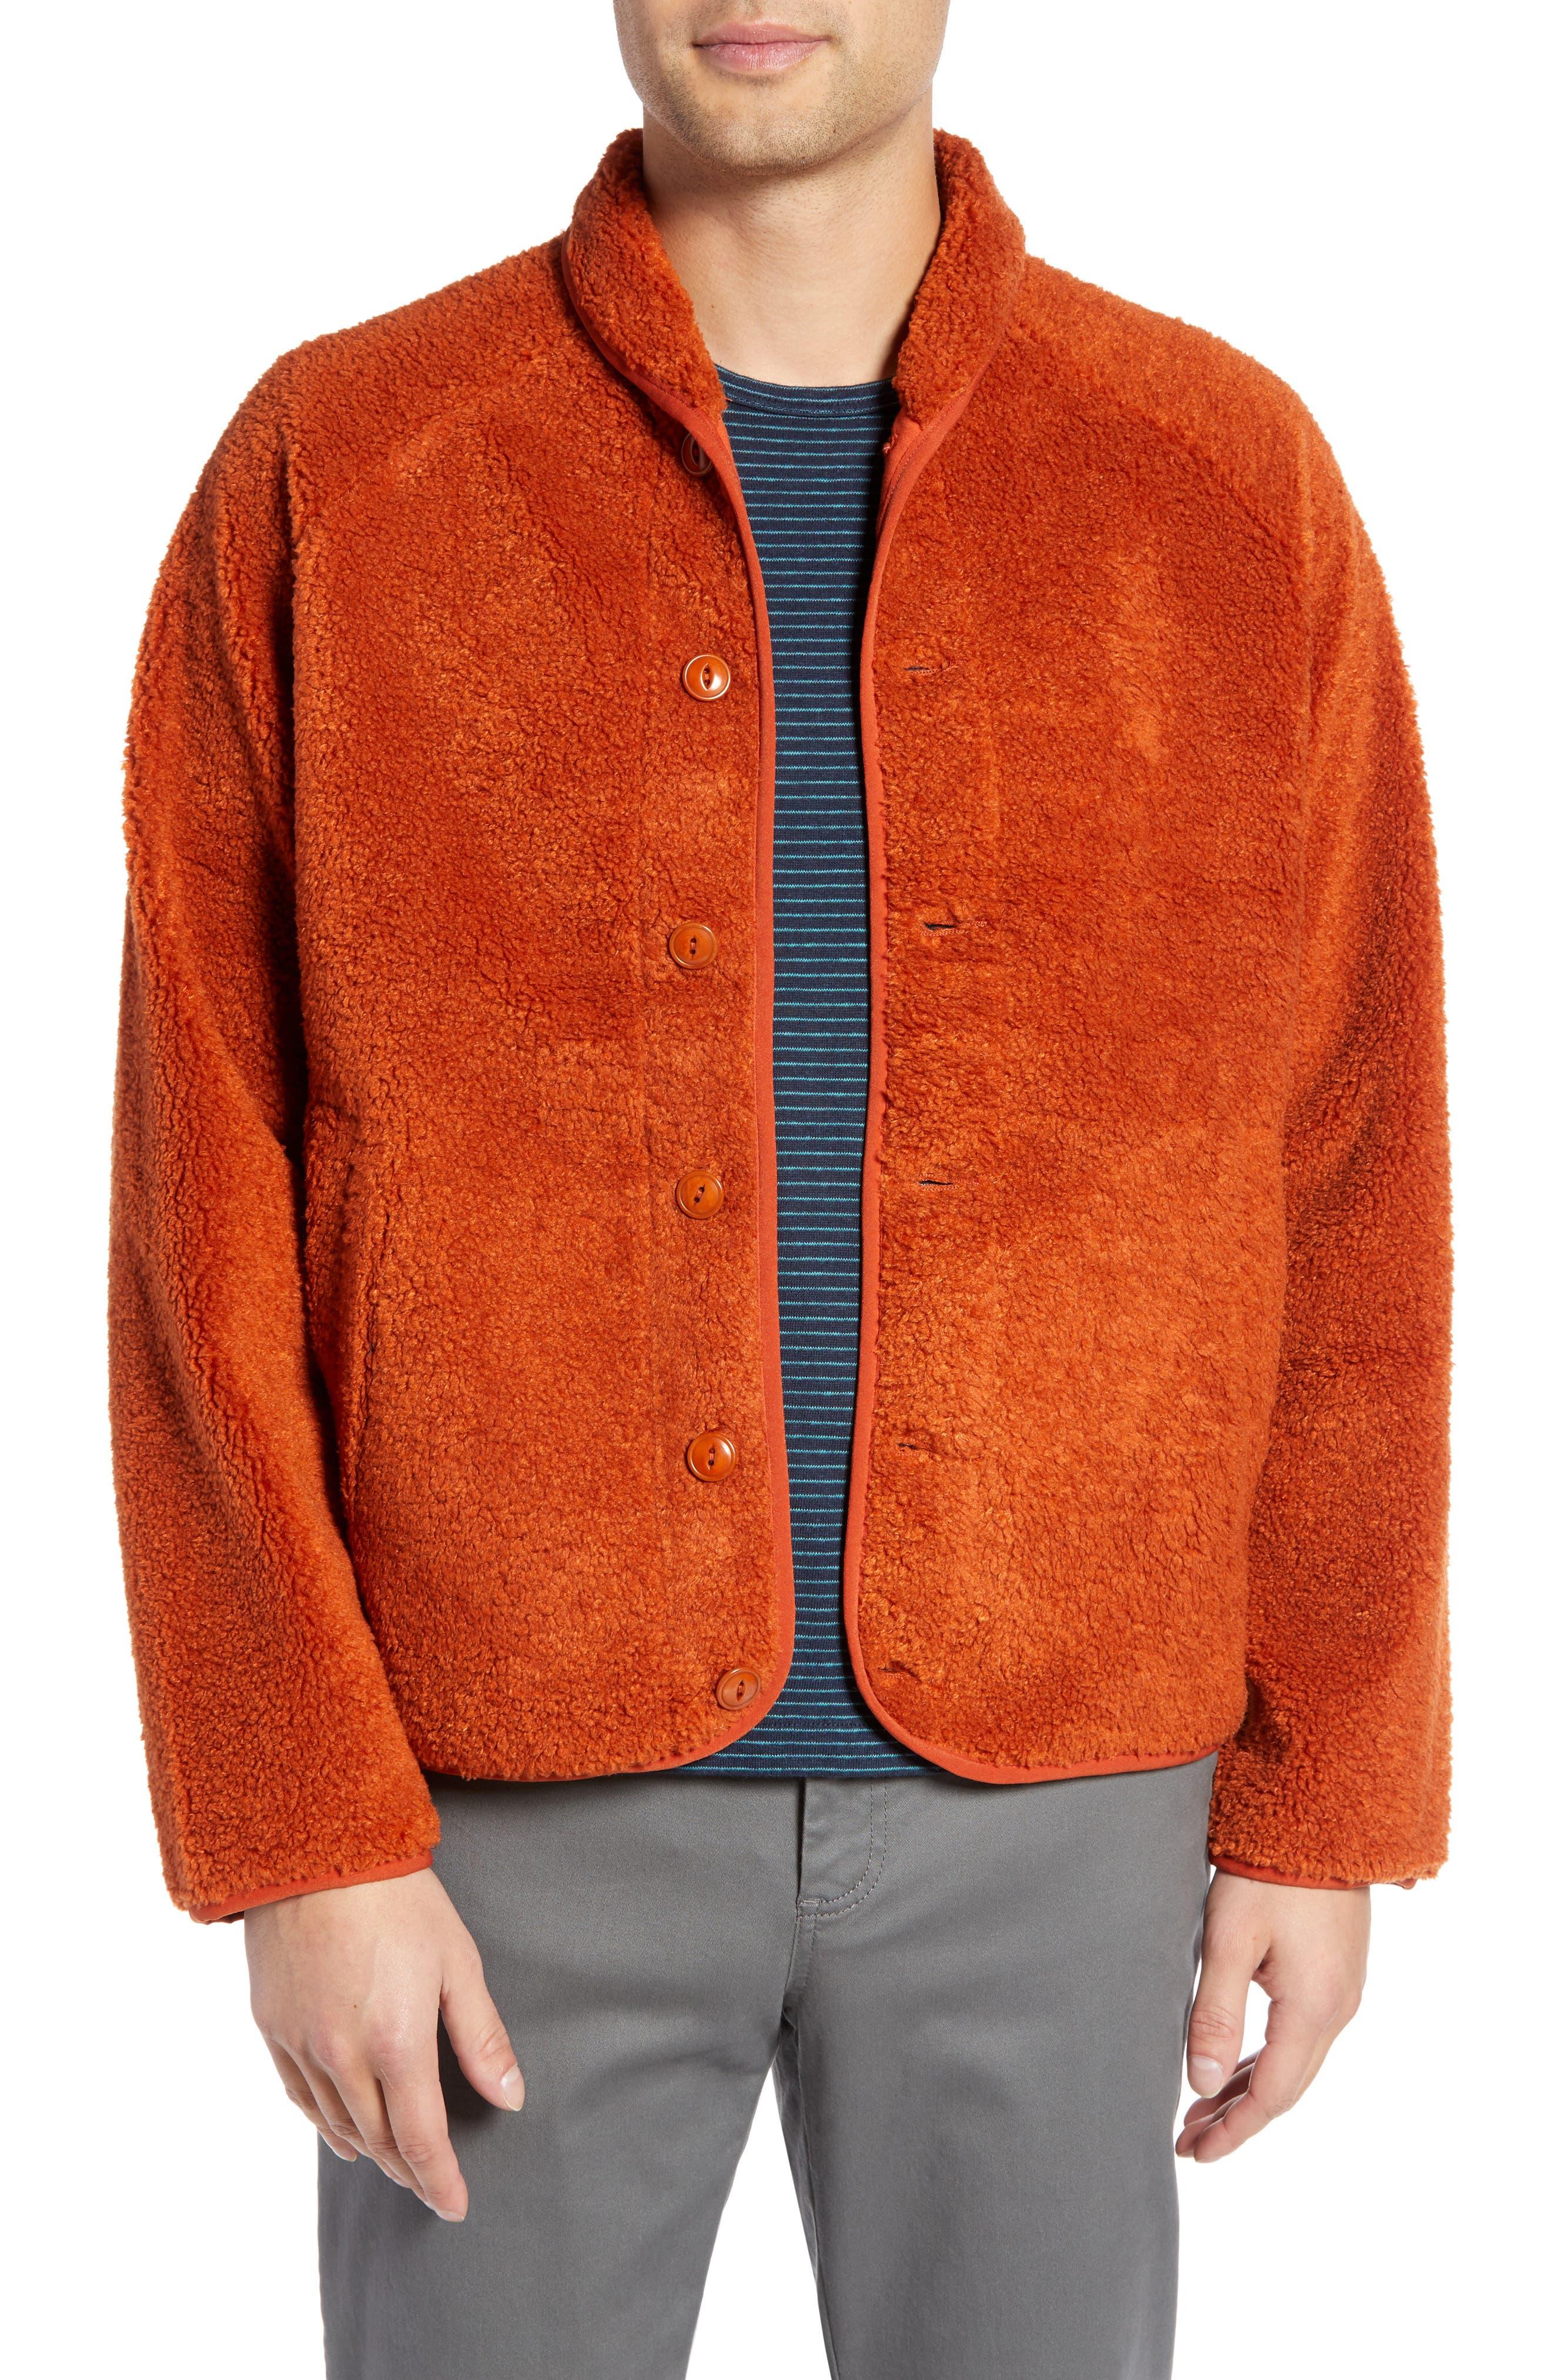 Beach Fleece Jacket,                         Main,                         color, 600